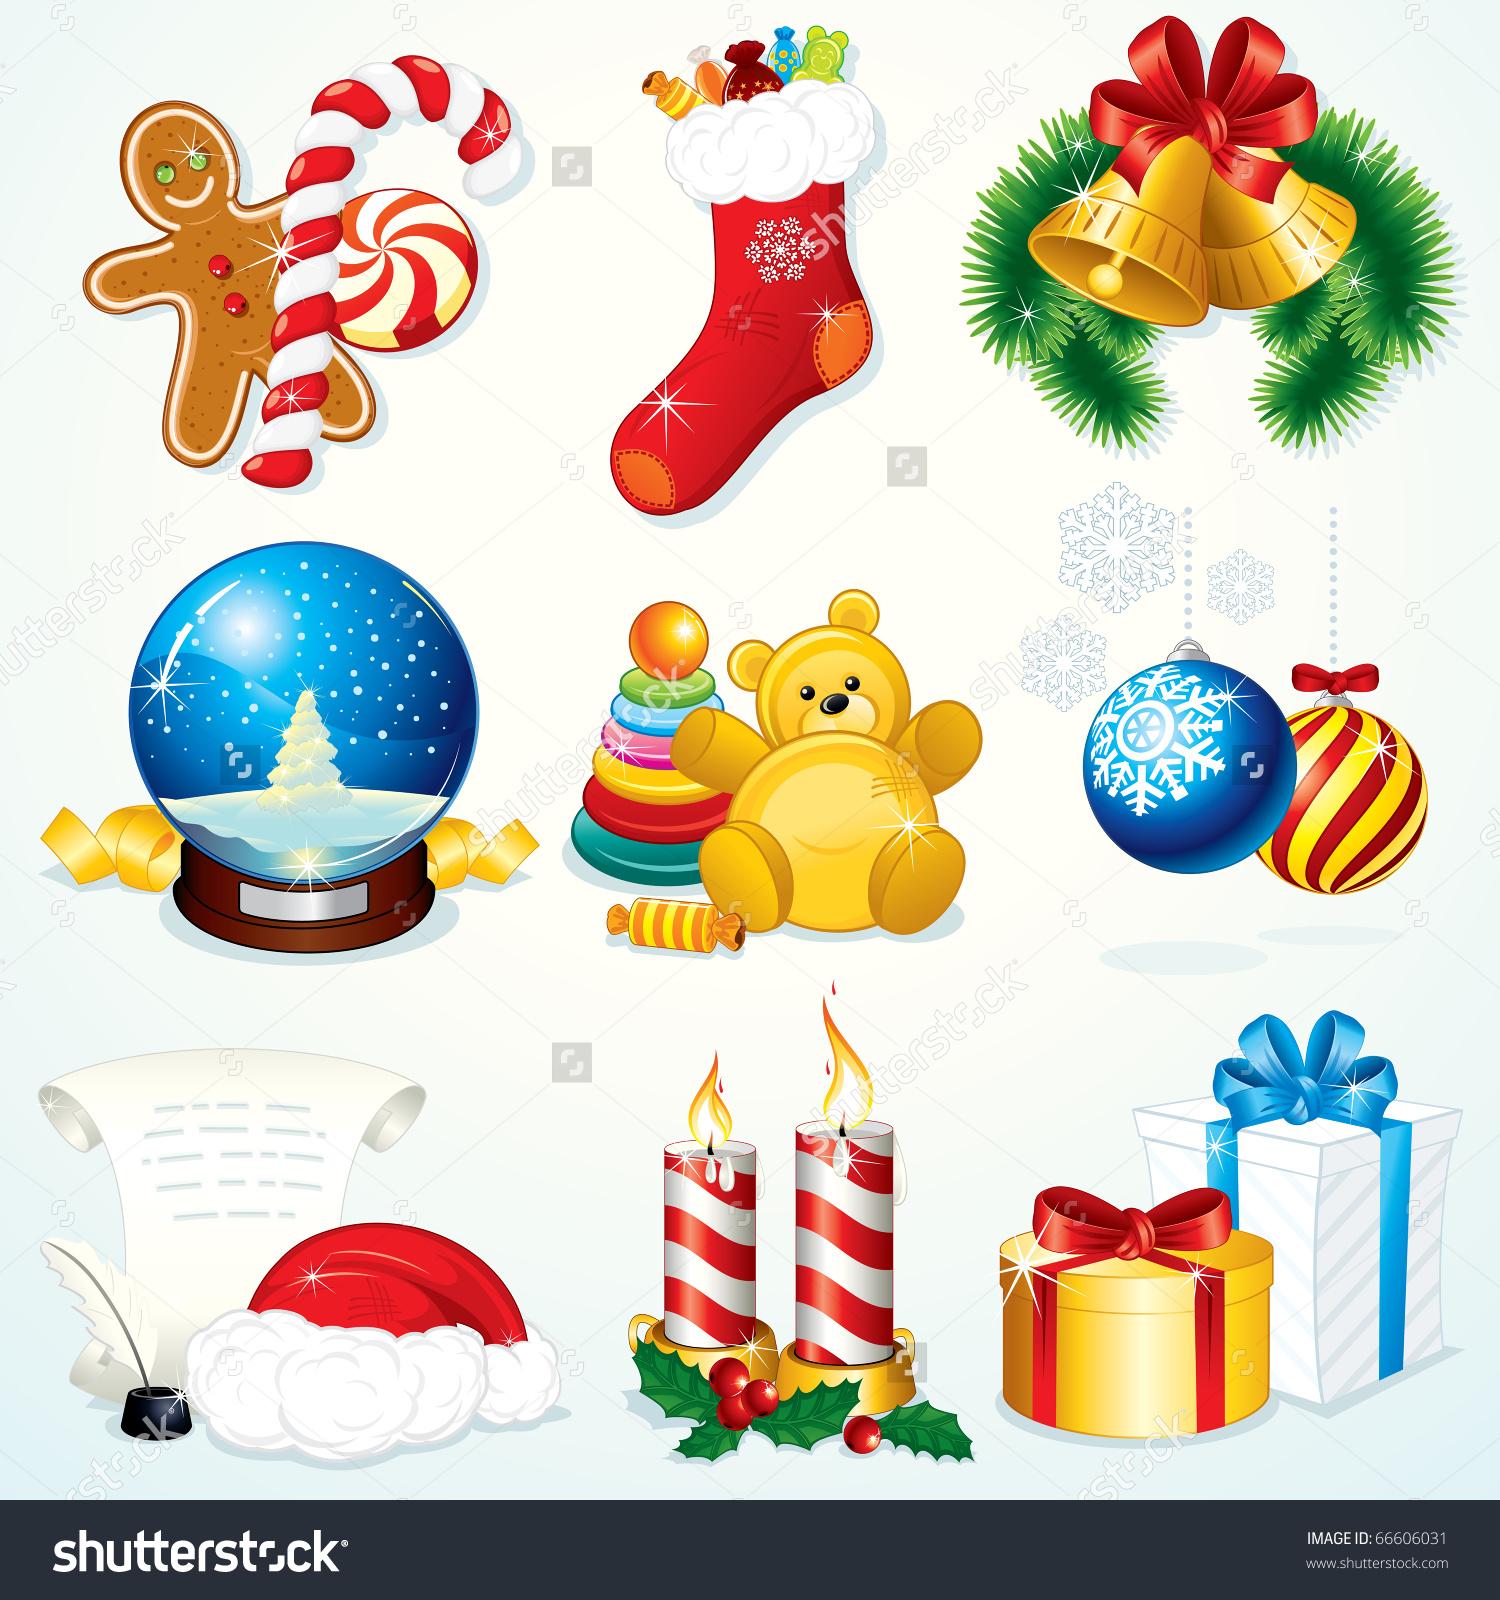 clipart of christmas symbols #11